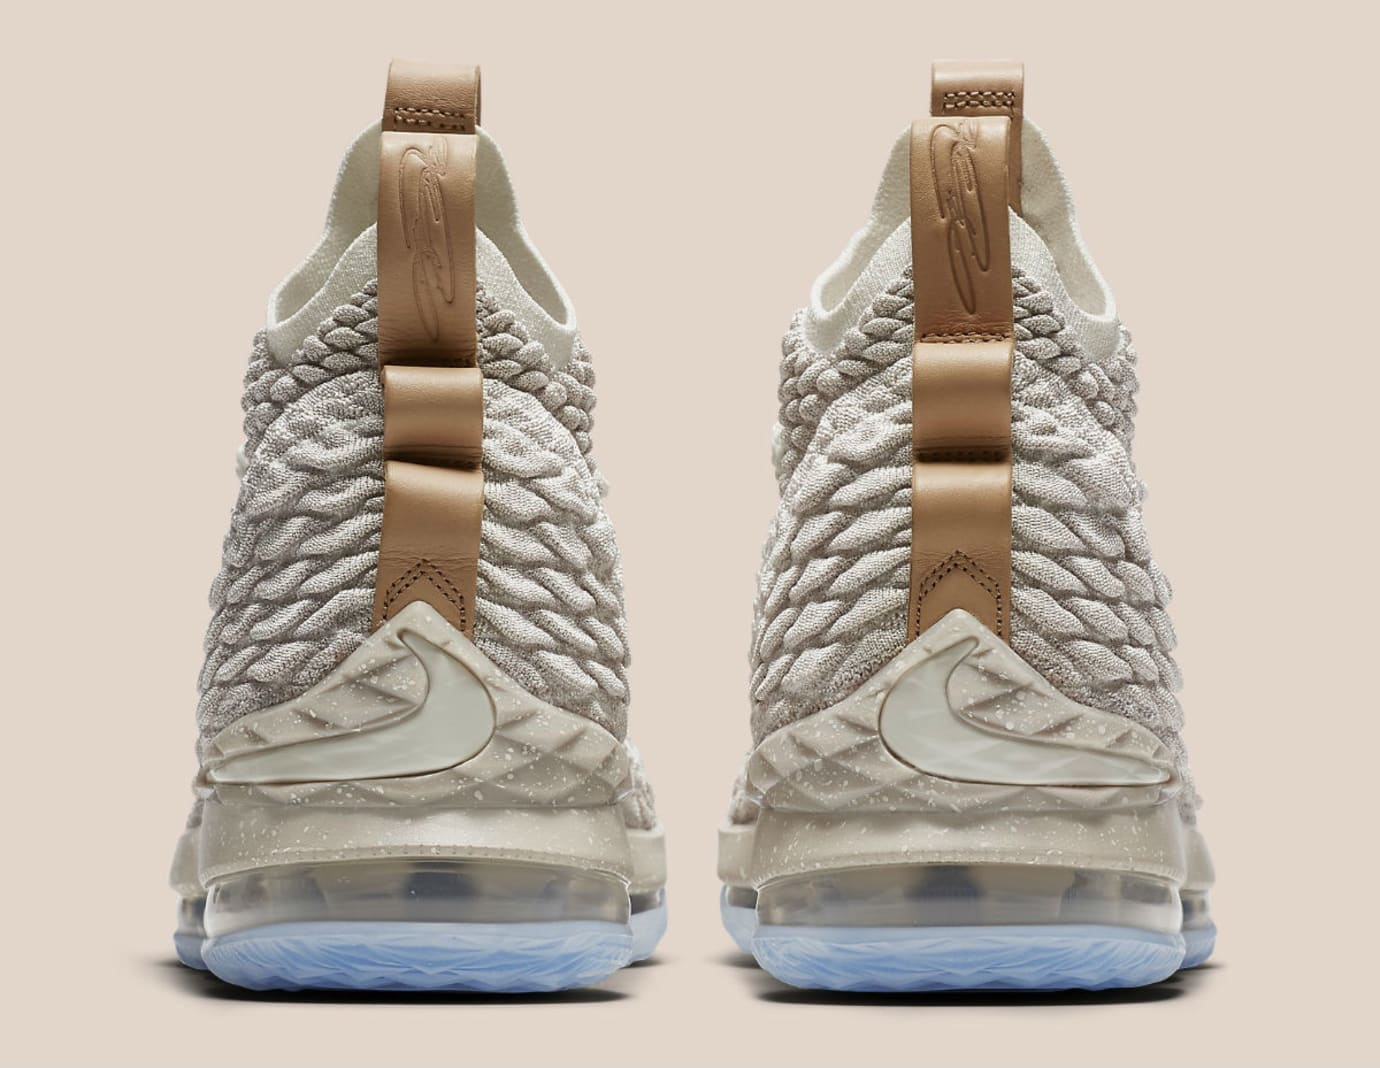 Nike LeBron 15 Ghost Release Date Heel 897649-200